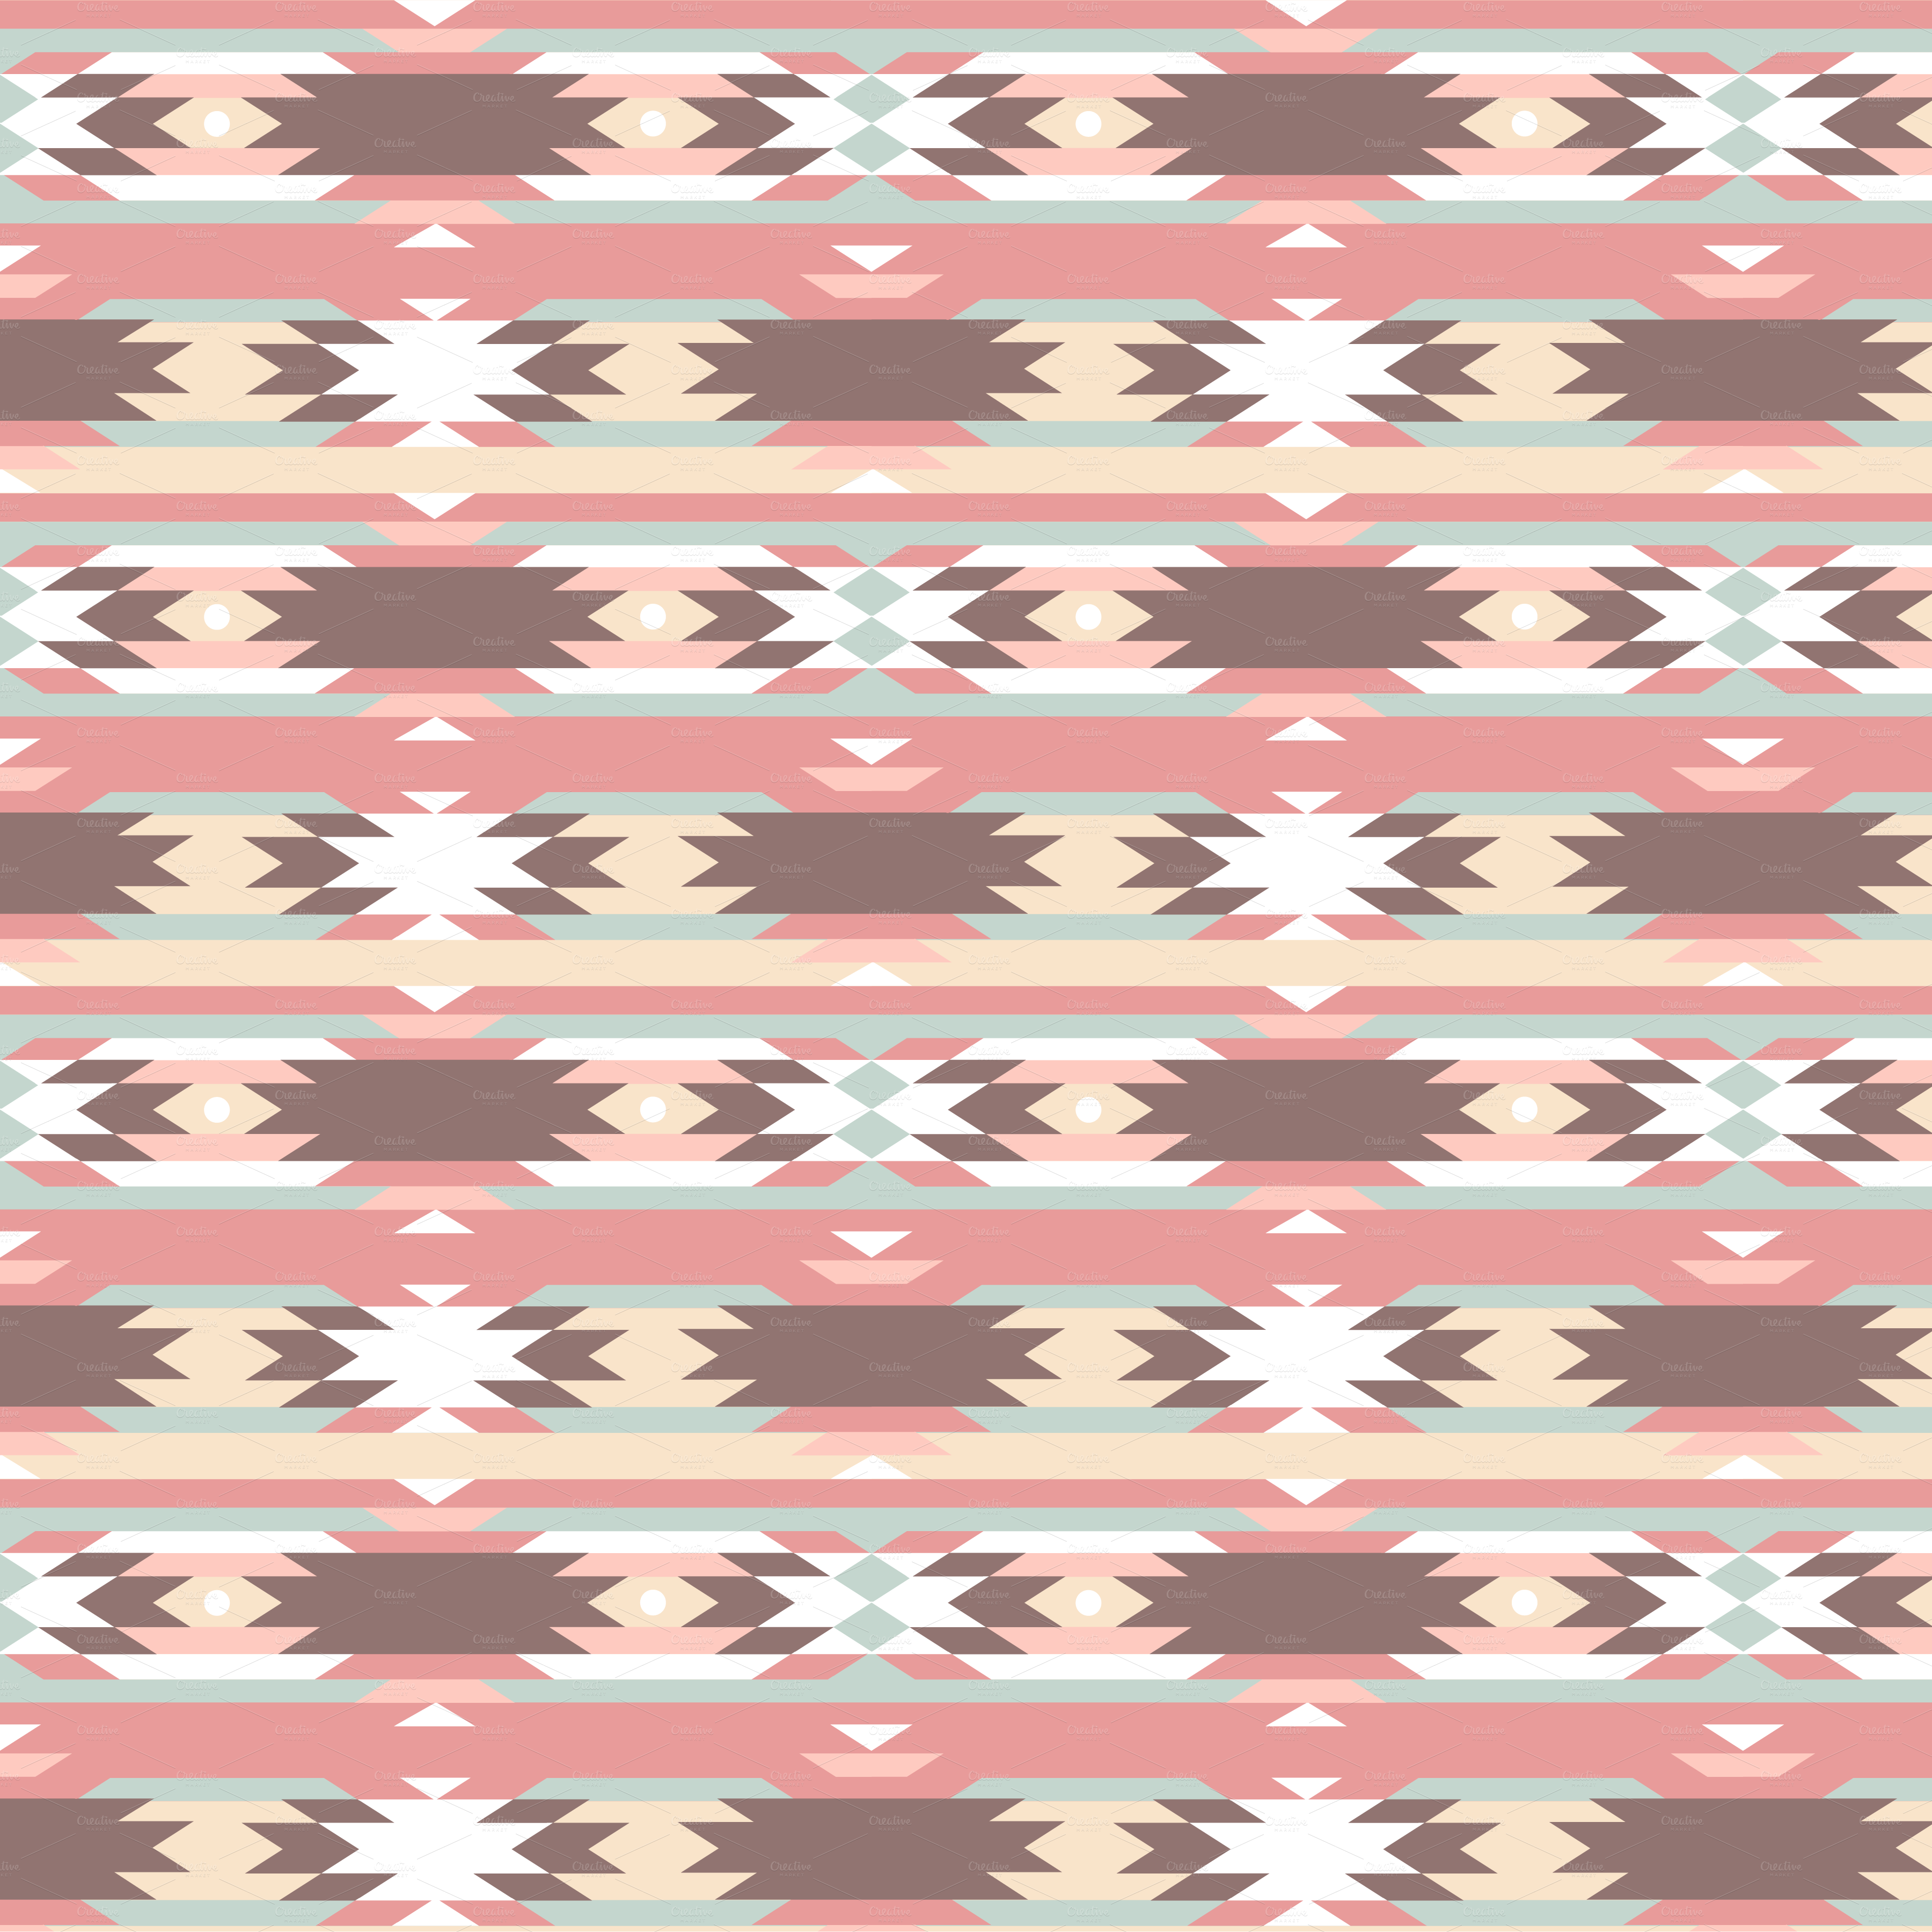 Tribal print background tumblr